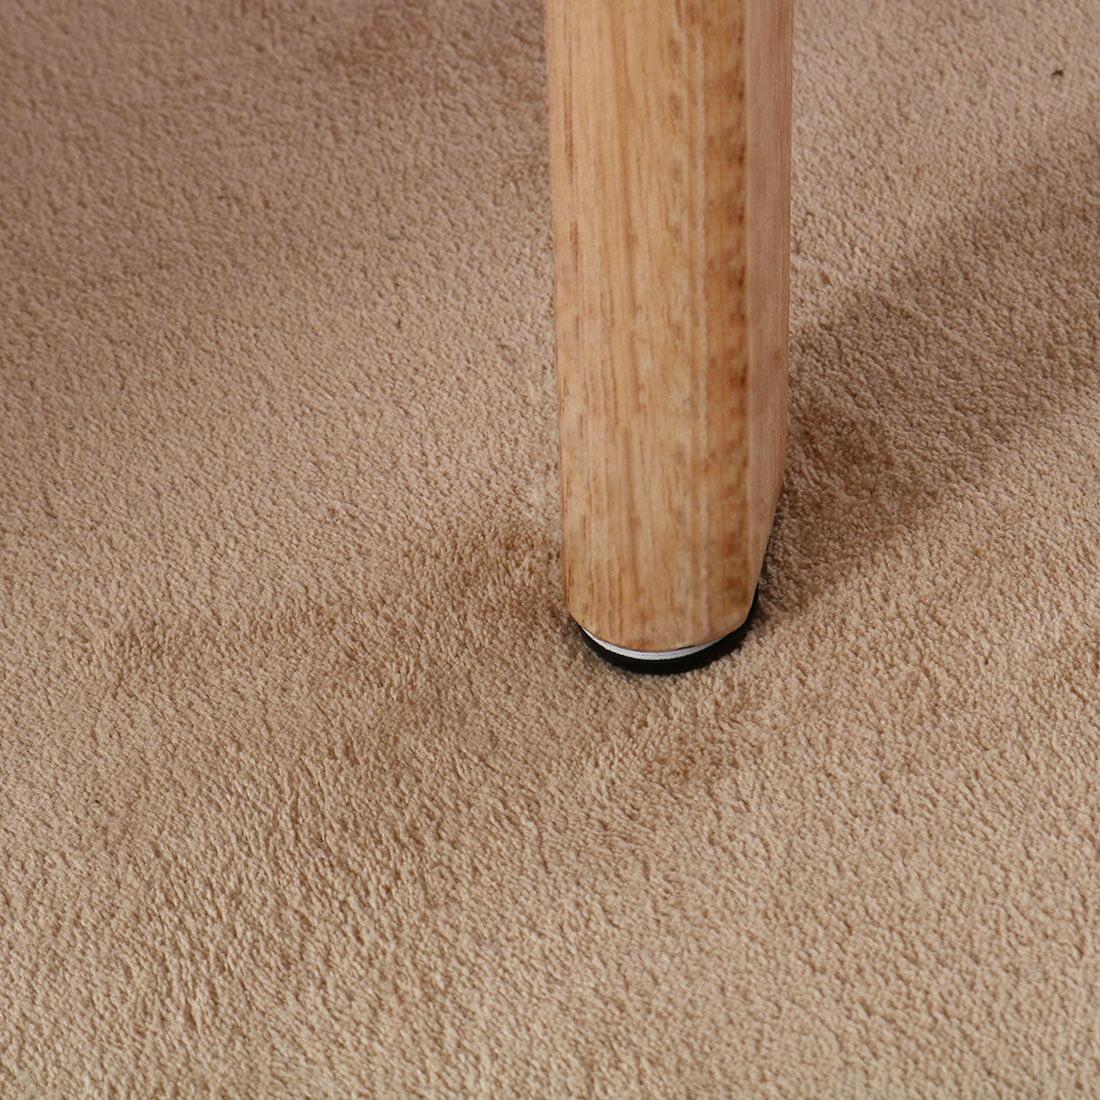 Stable Screw Furniture Slider Glides Chair Sofa Foot Mover Light Blue 4pcs - image 1 de 5